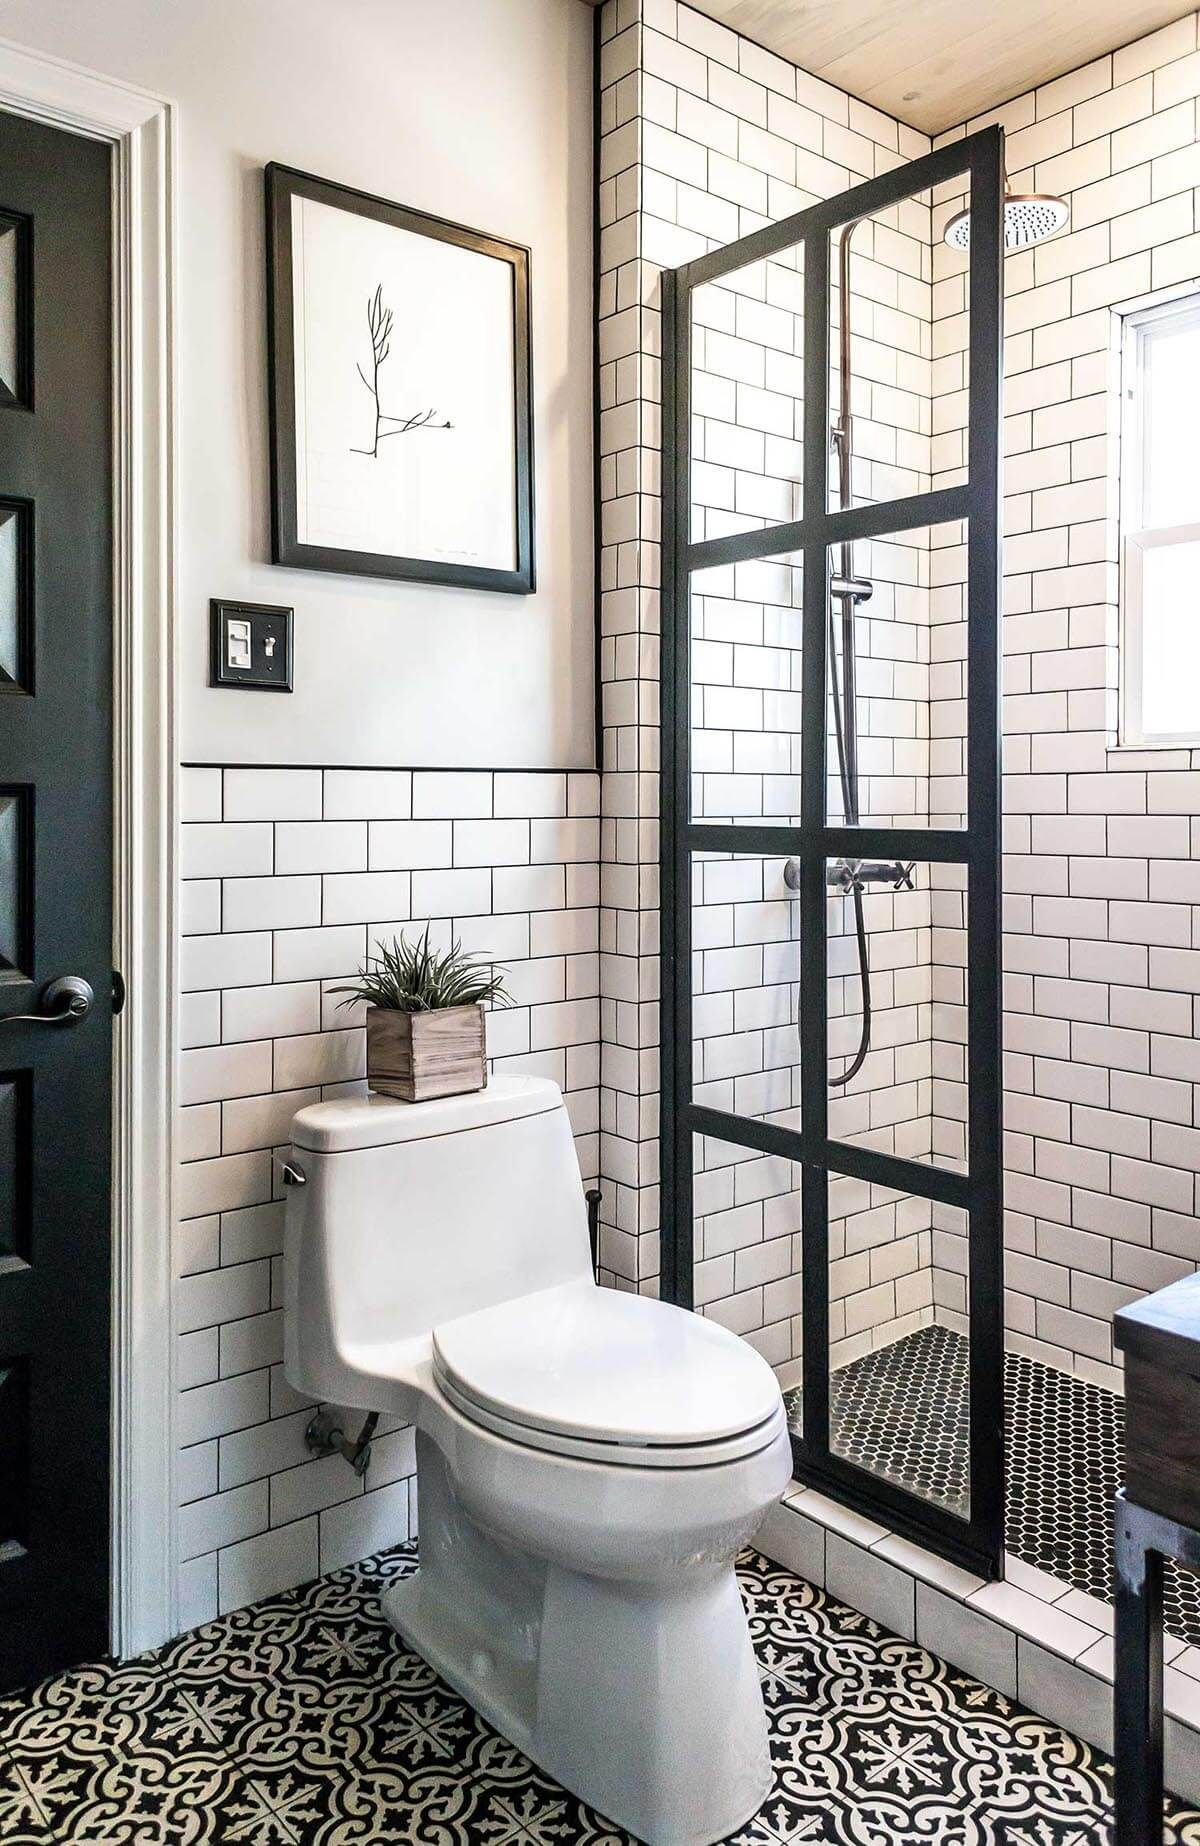 32 Best Shower Tile Ideas That Will Transform Your Bathroom In 2020 Small Bathroom Remodel Bathroom Design Small Bathroom Remodel Master